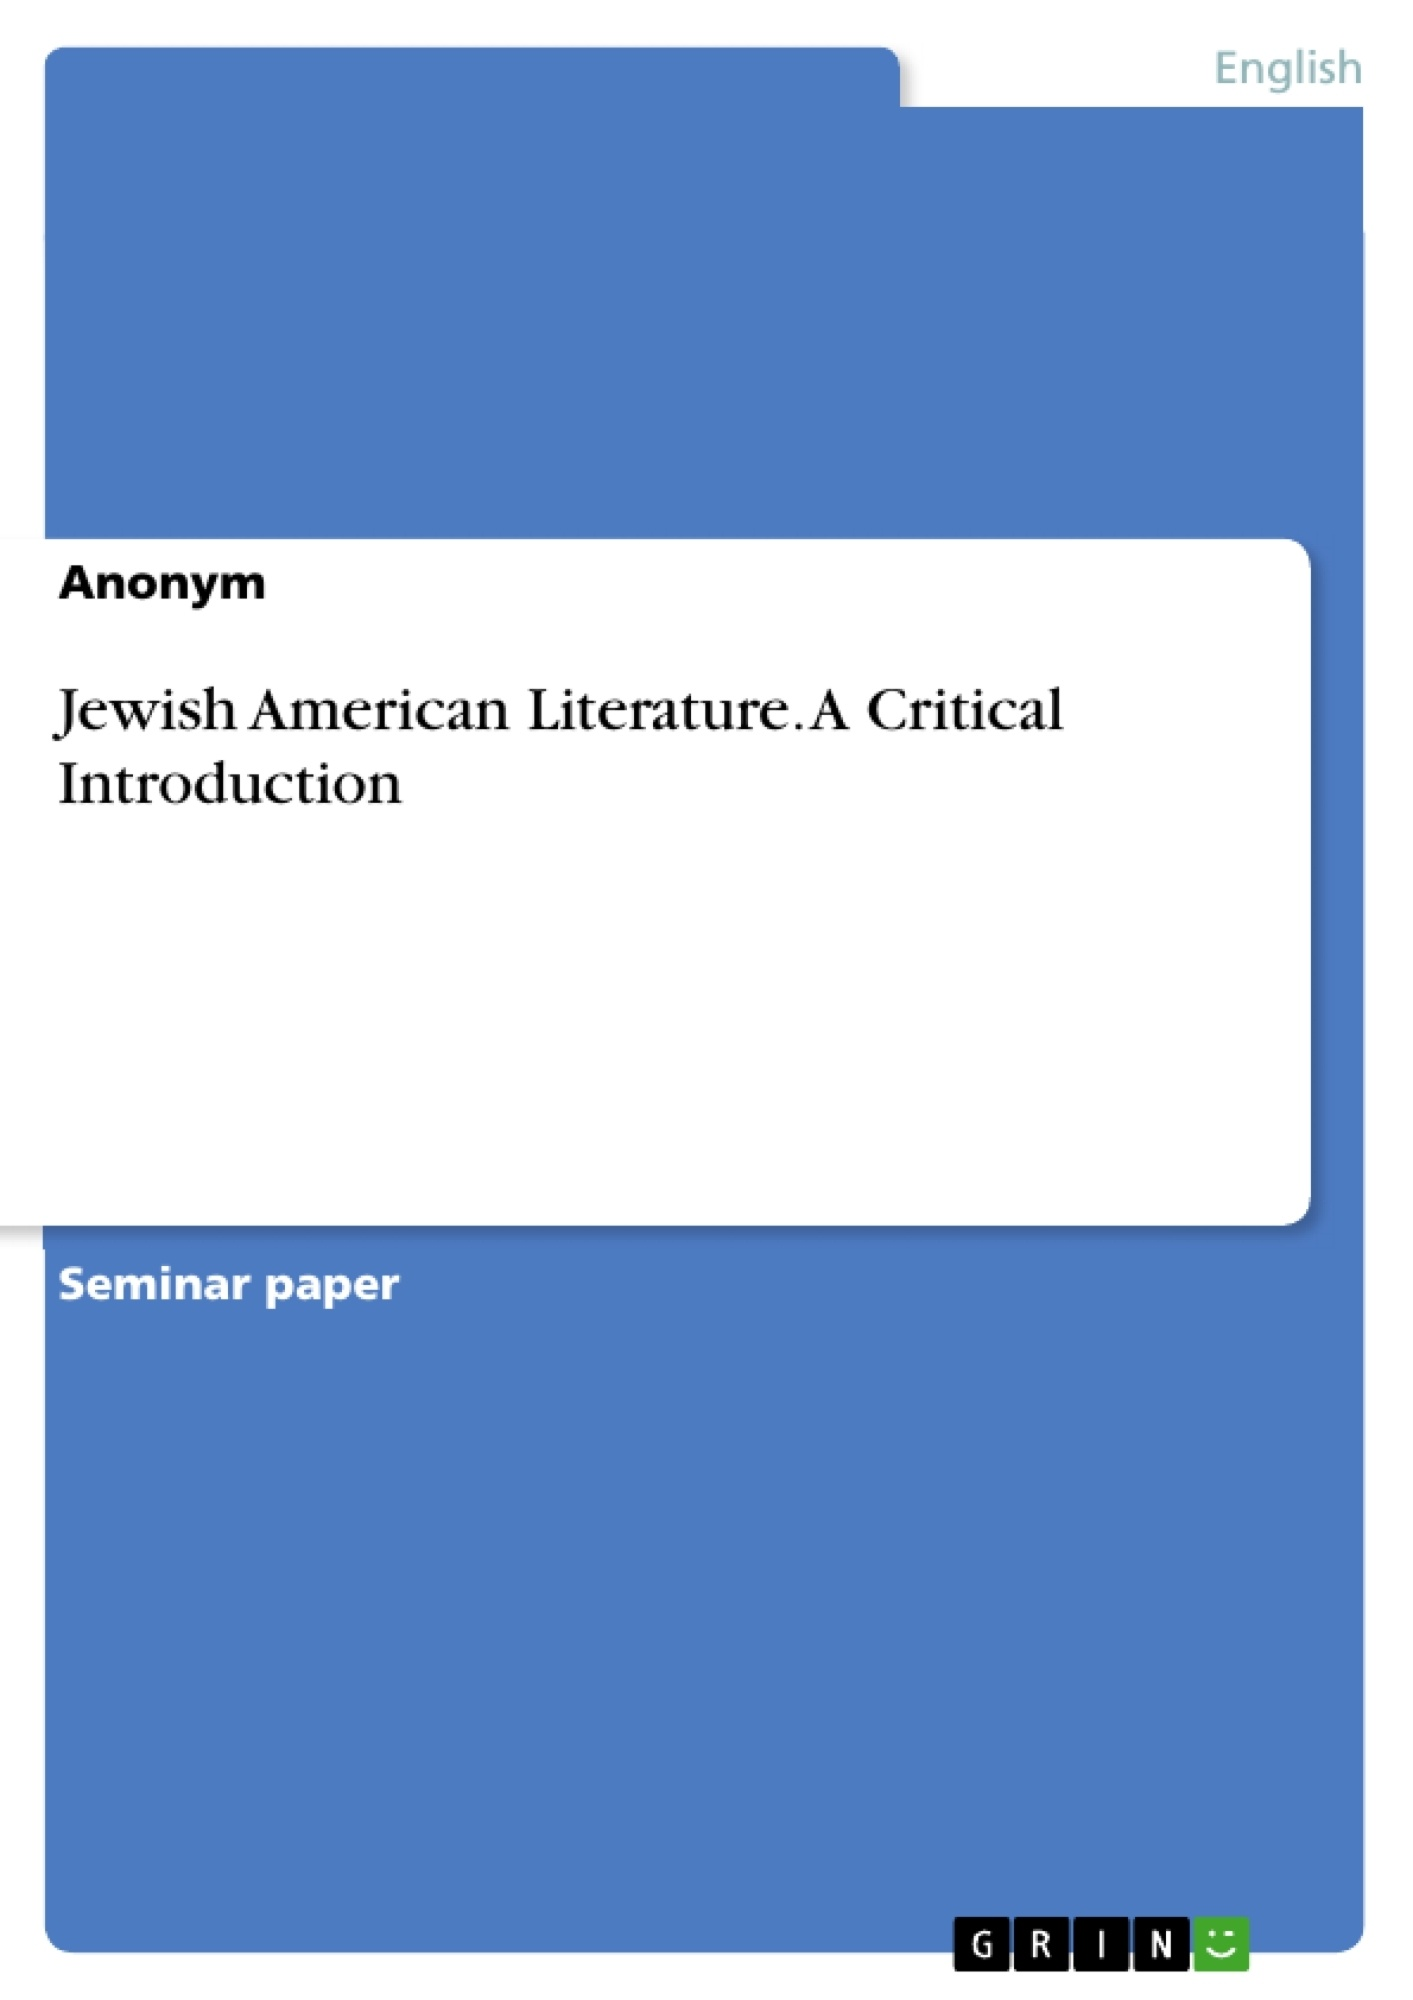 Title: Jewish American Literature. A Critical Introduction